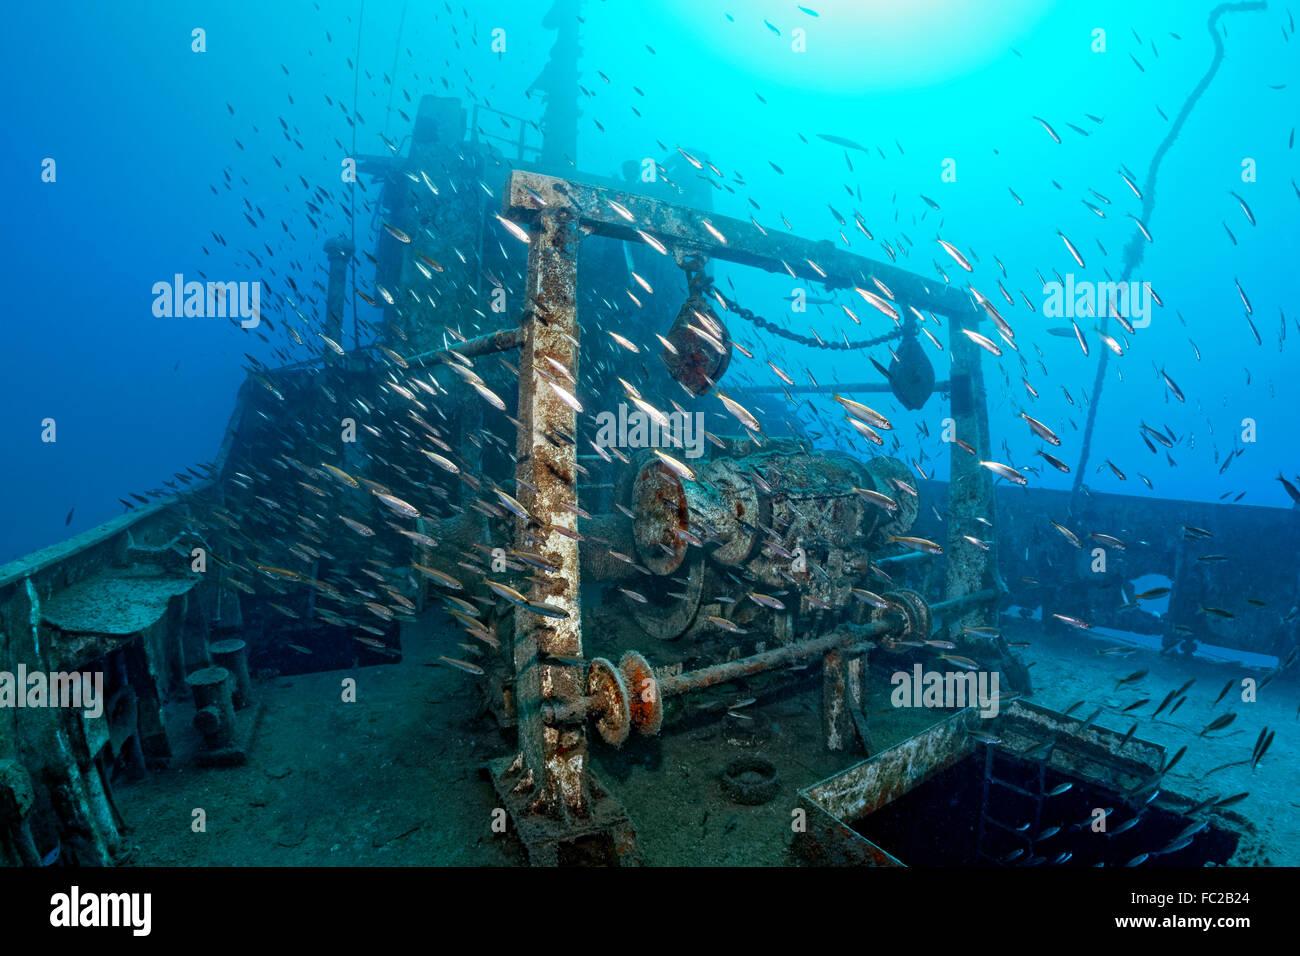 Shoal, Mediterranean horse mackerel (Trachurus mediterraneus), Shipwreck Constandis, sunk for divers, underwater - Stock Image